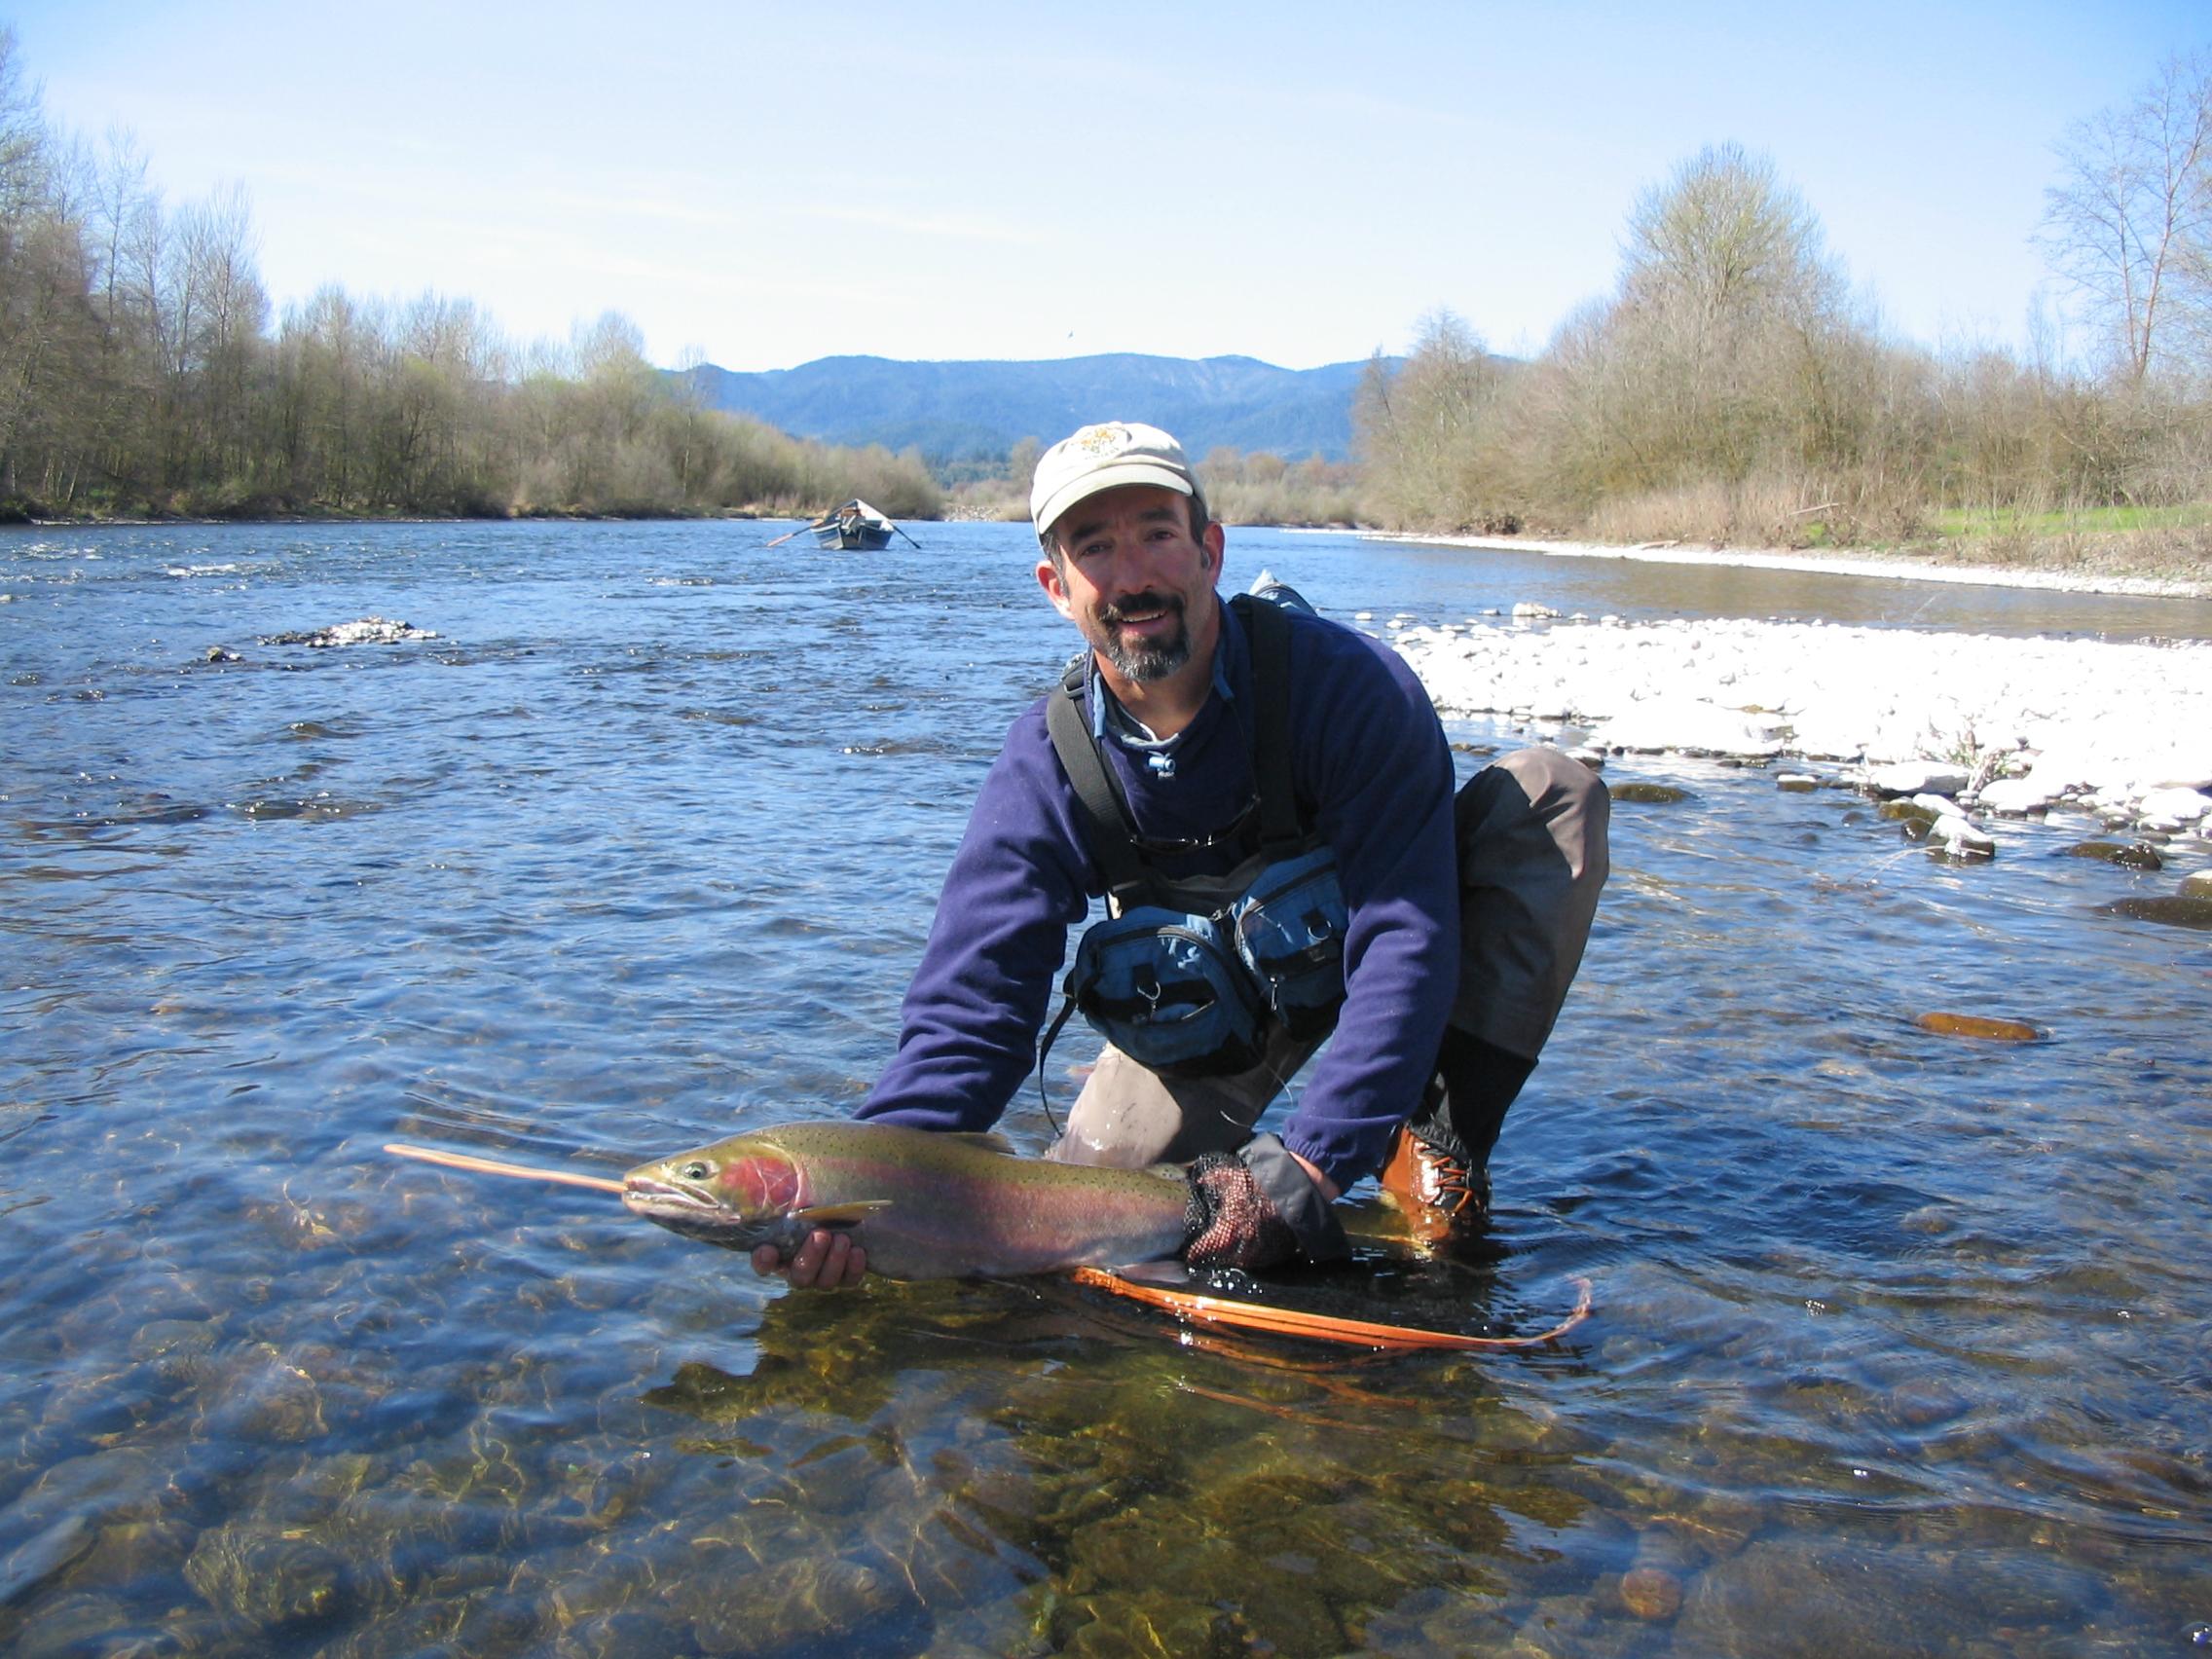 Xola for Fly fishing northern california